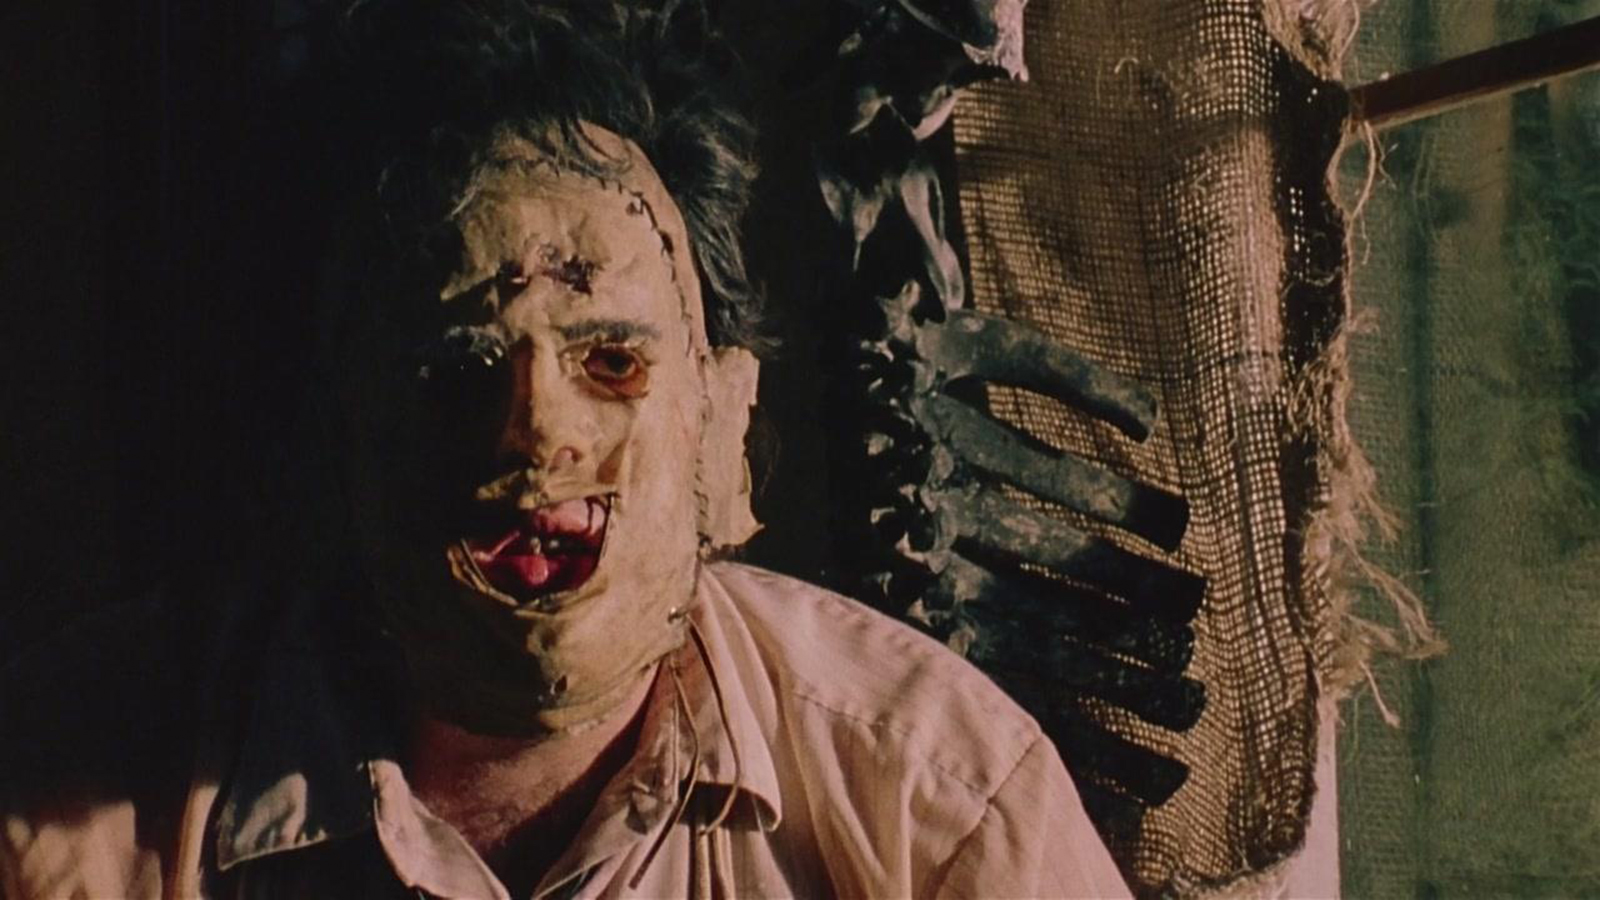 The Texas Chain Saw Massacre, Leatherface